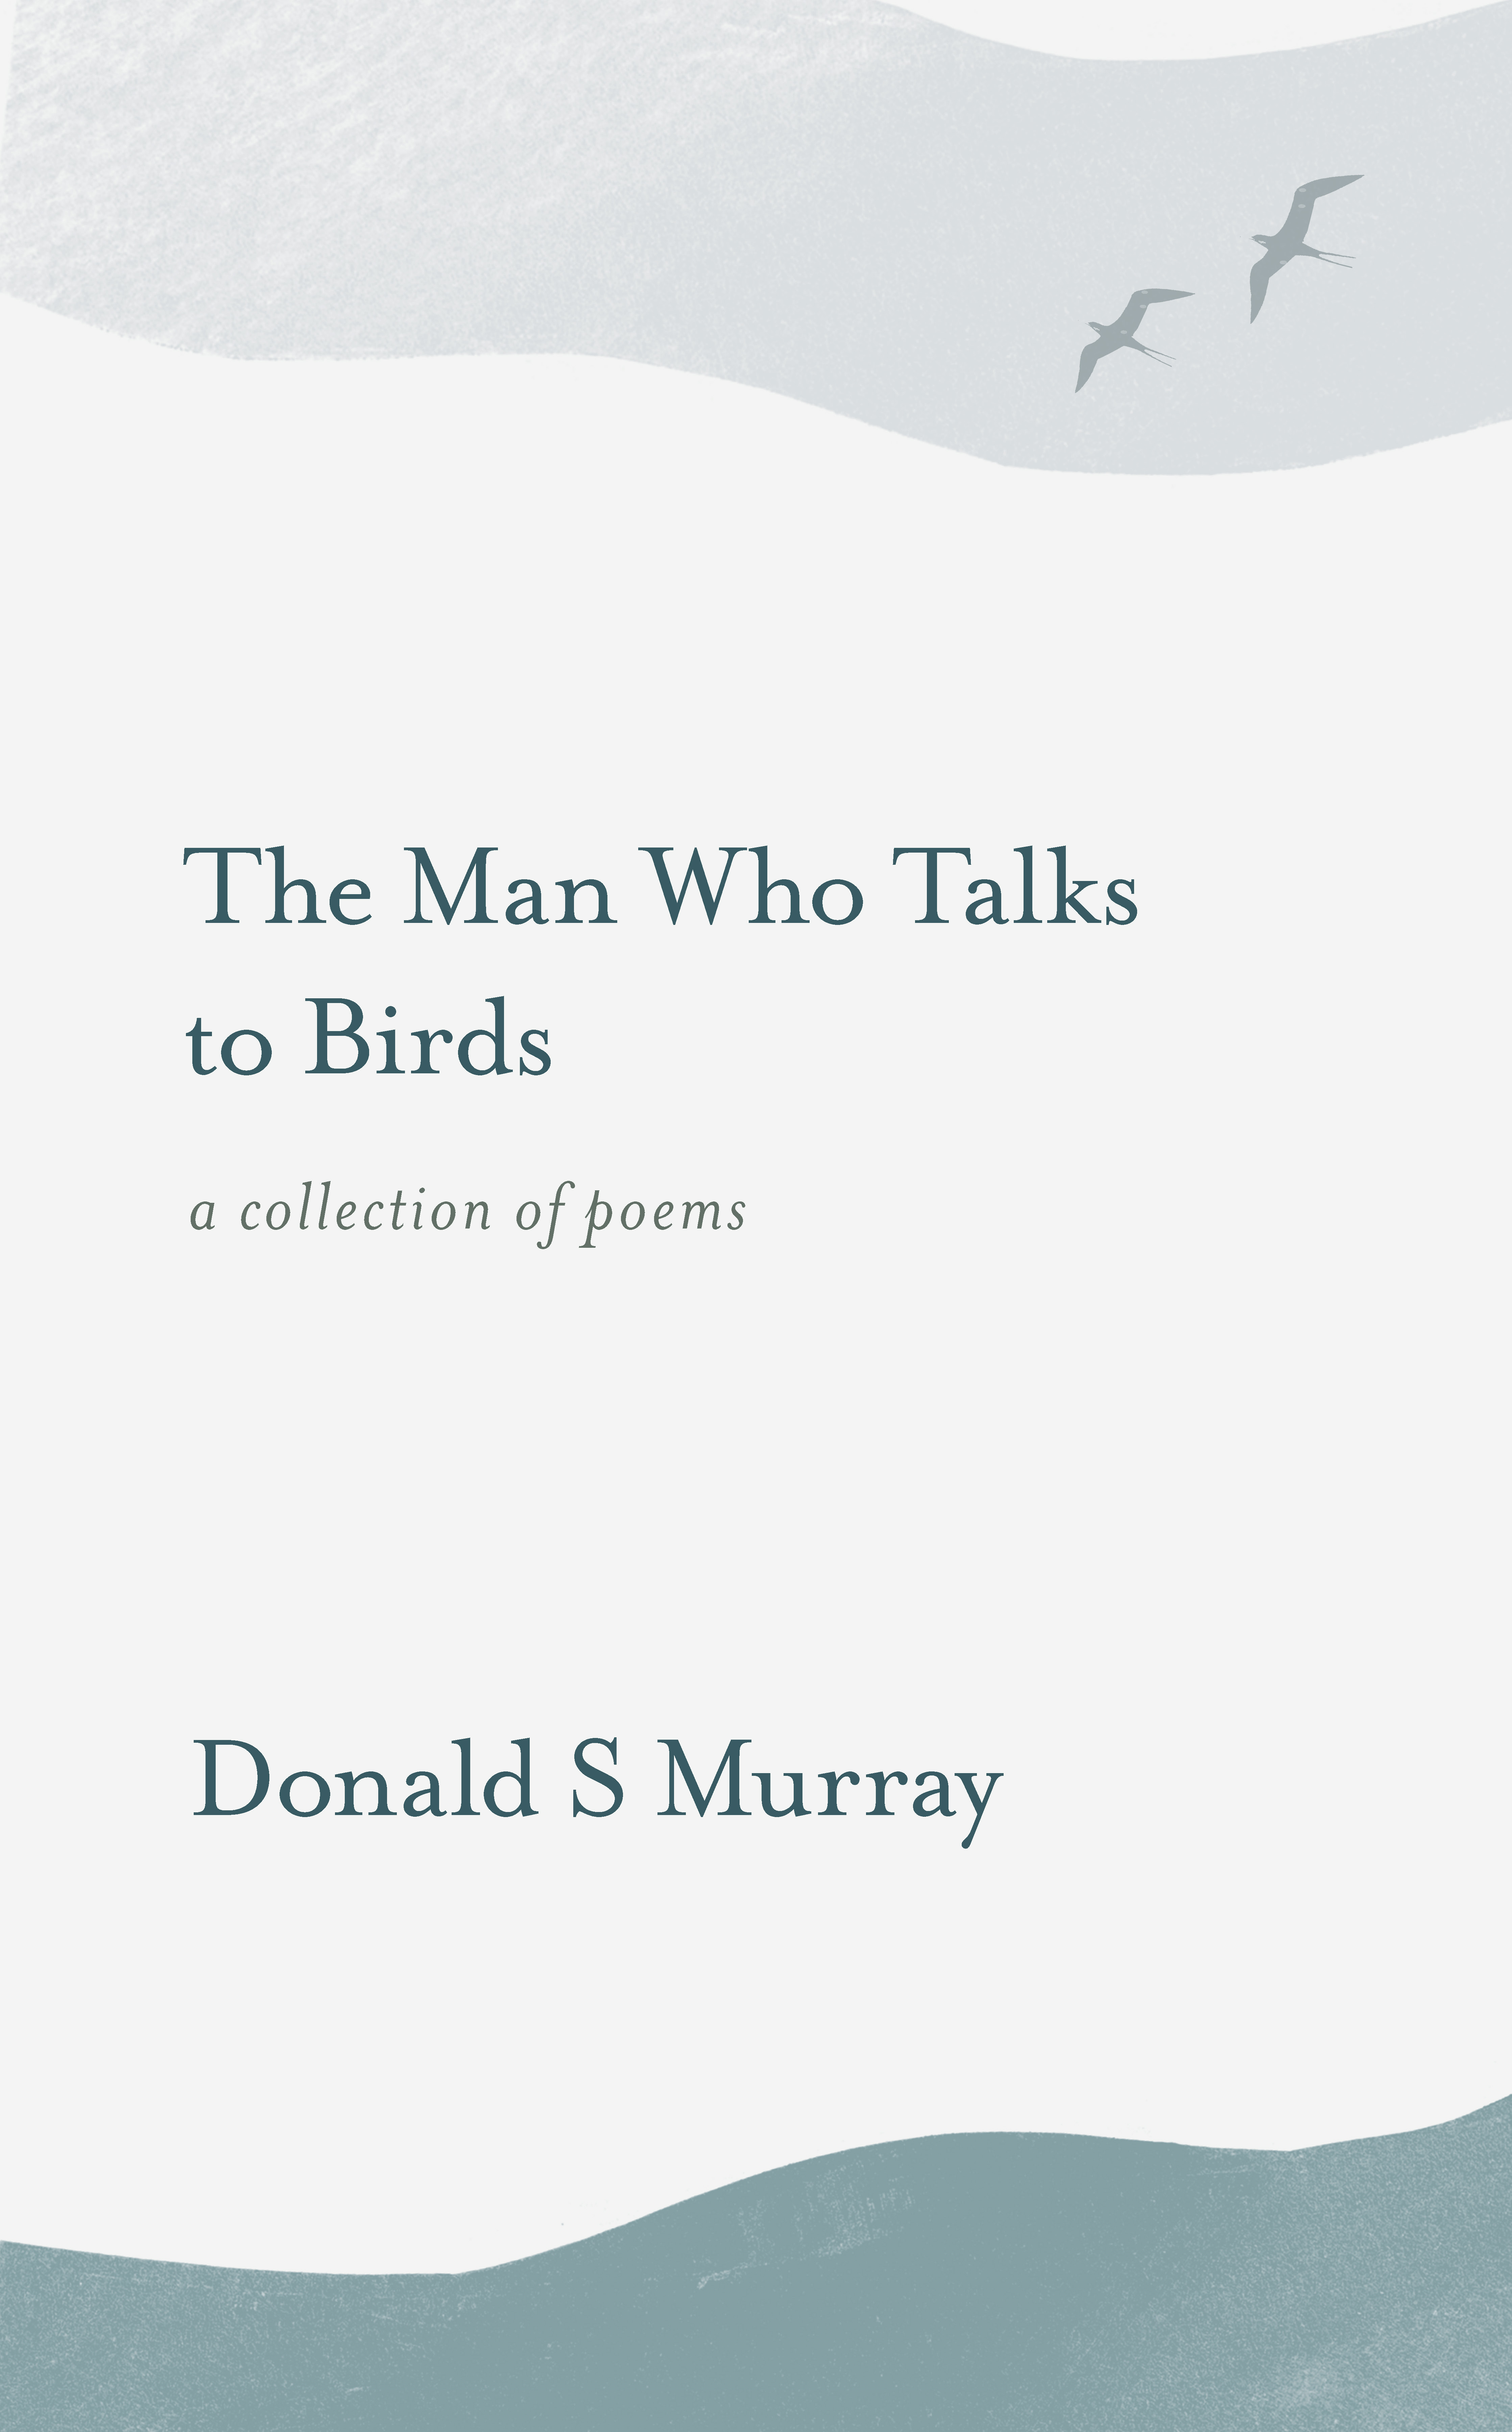 The Man Who Talks To Birds